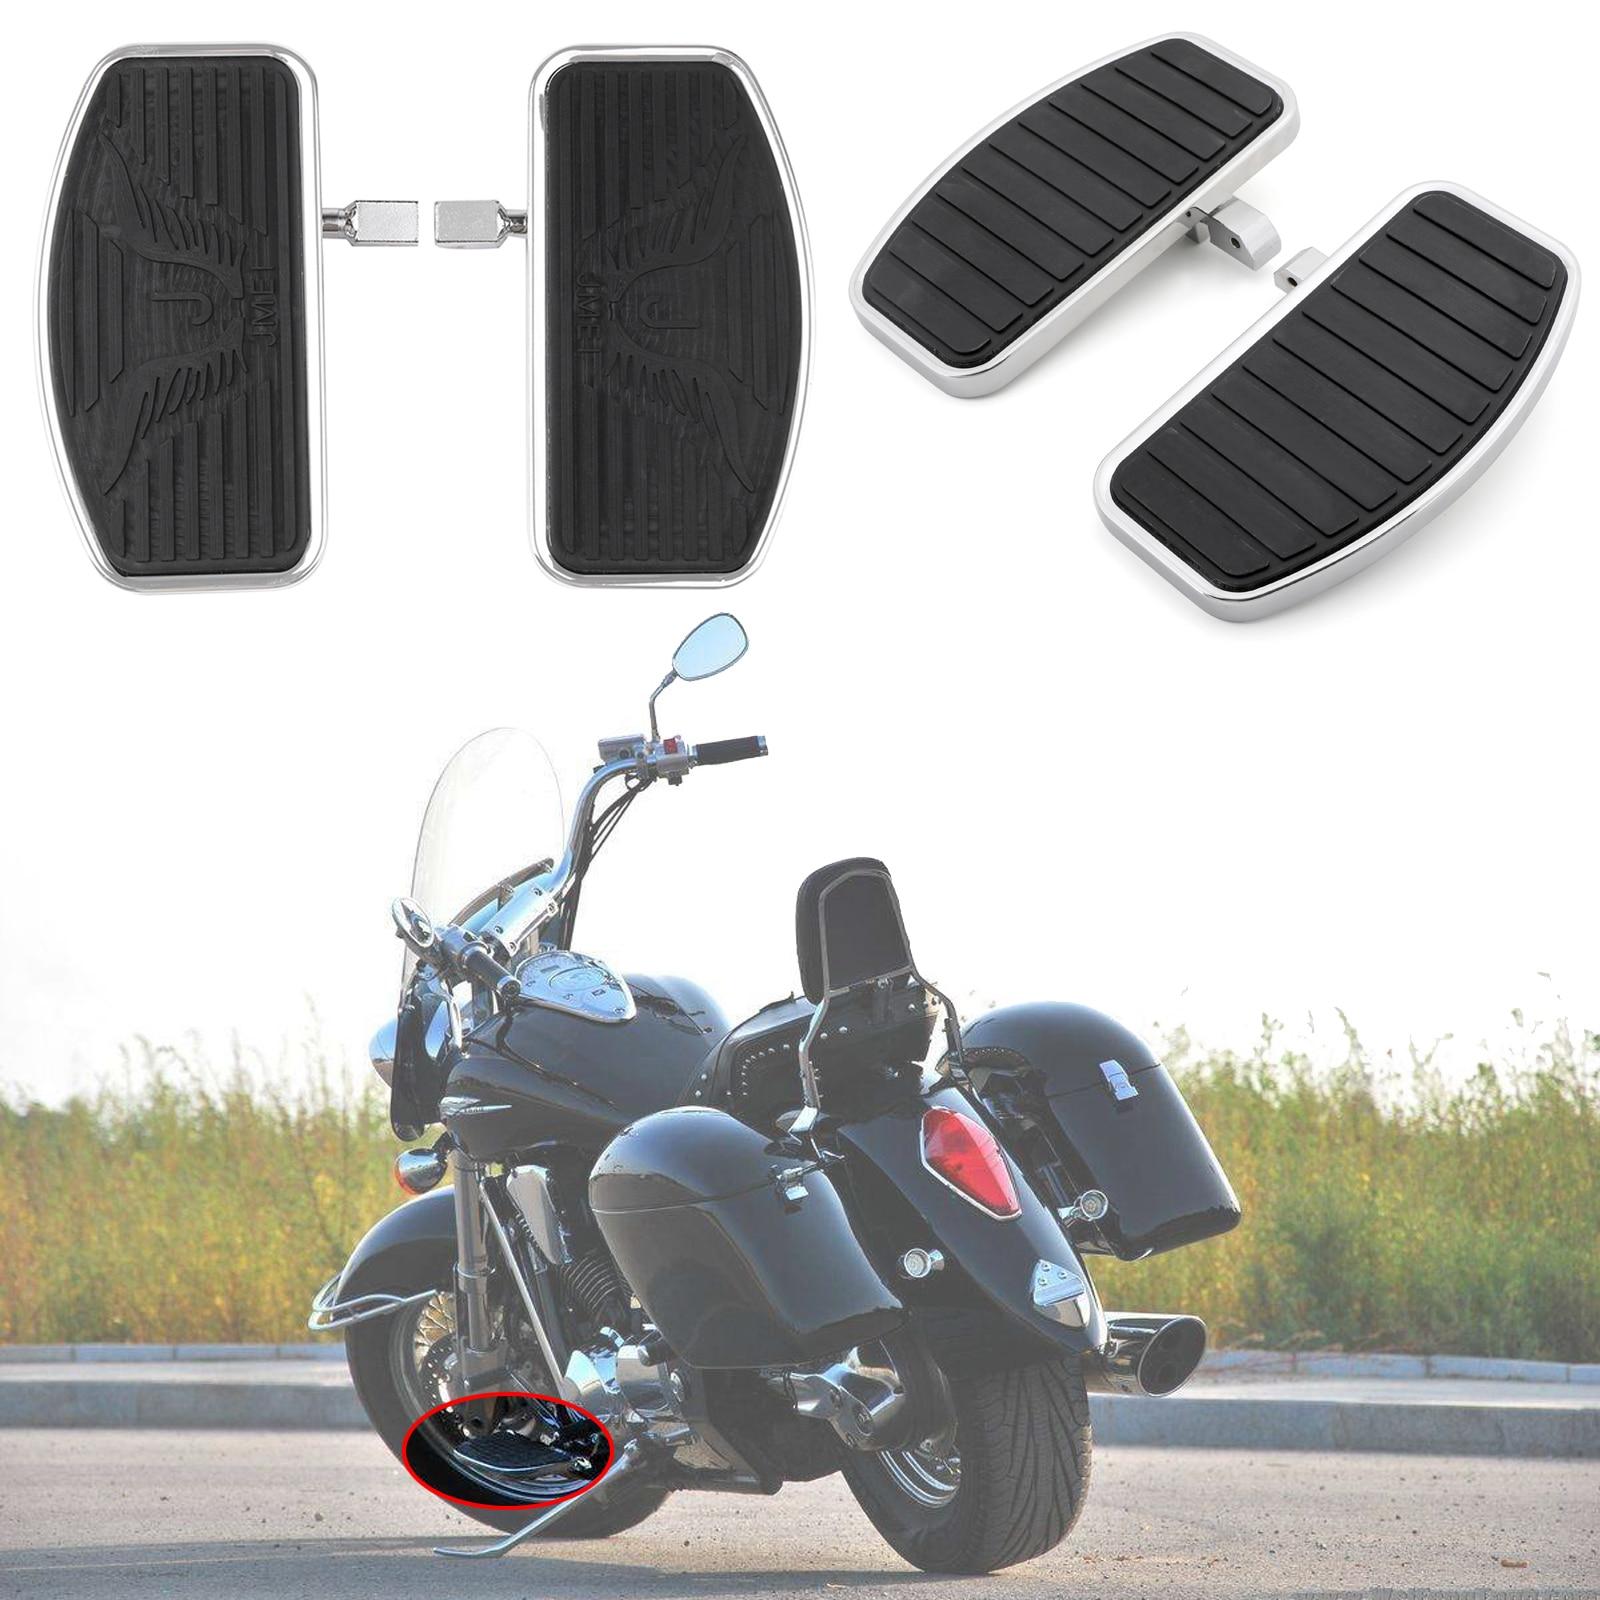 Motorcycle Floorboards For Honda Shadow Aero 750 VT750 For Yamaha VSTAR XVS 400 650 XVS650 Drag Star 600 Virago XV250 Accessory